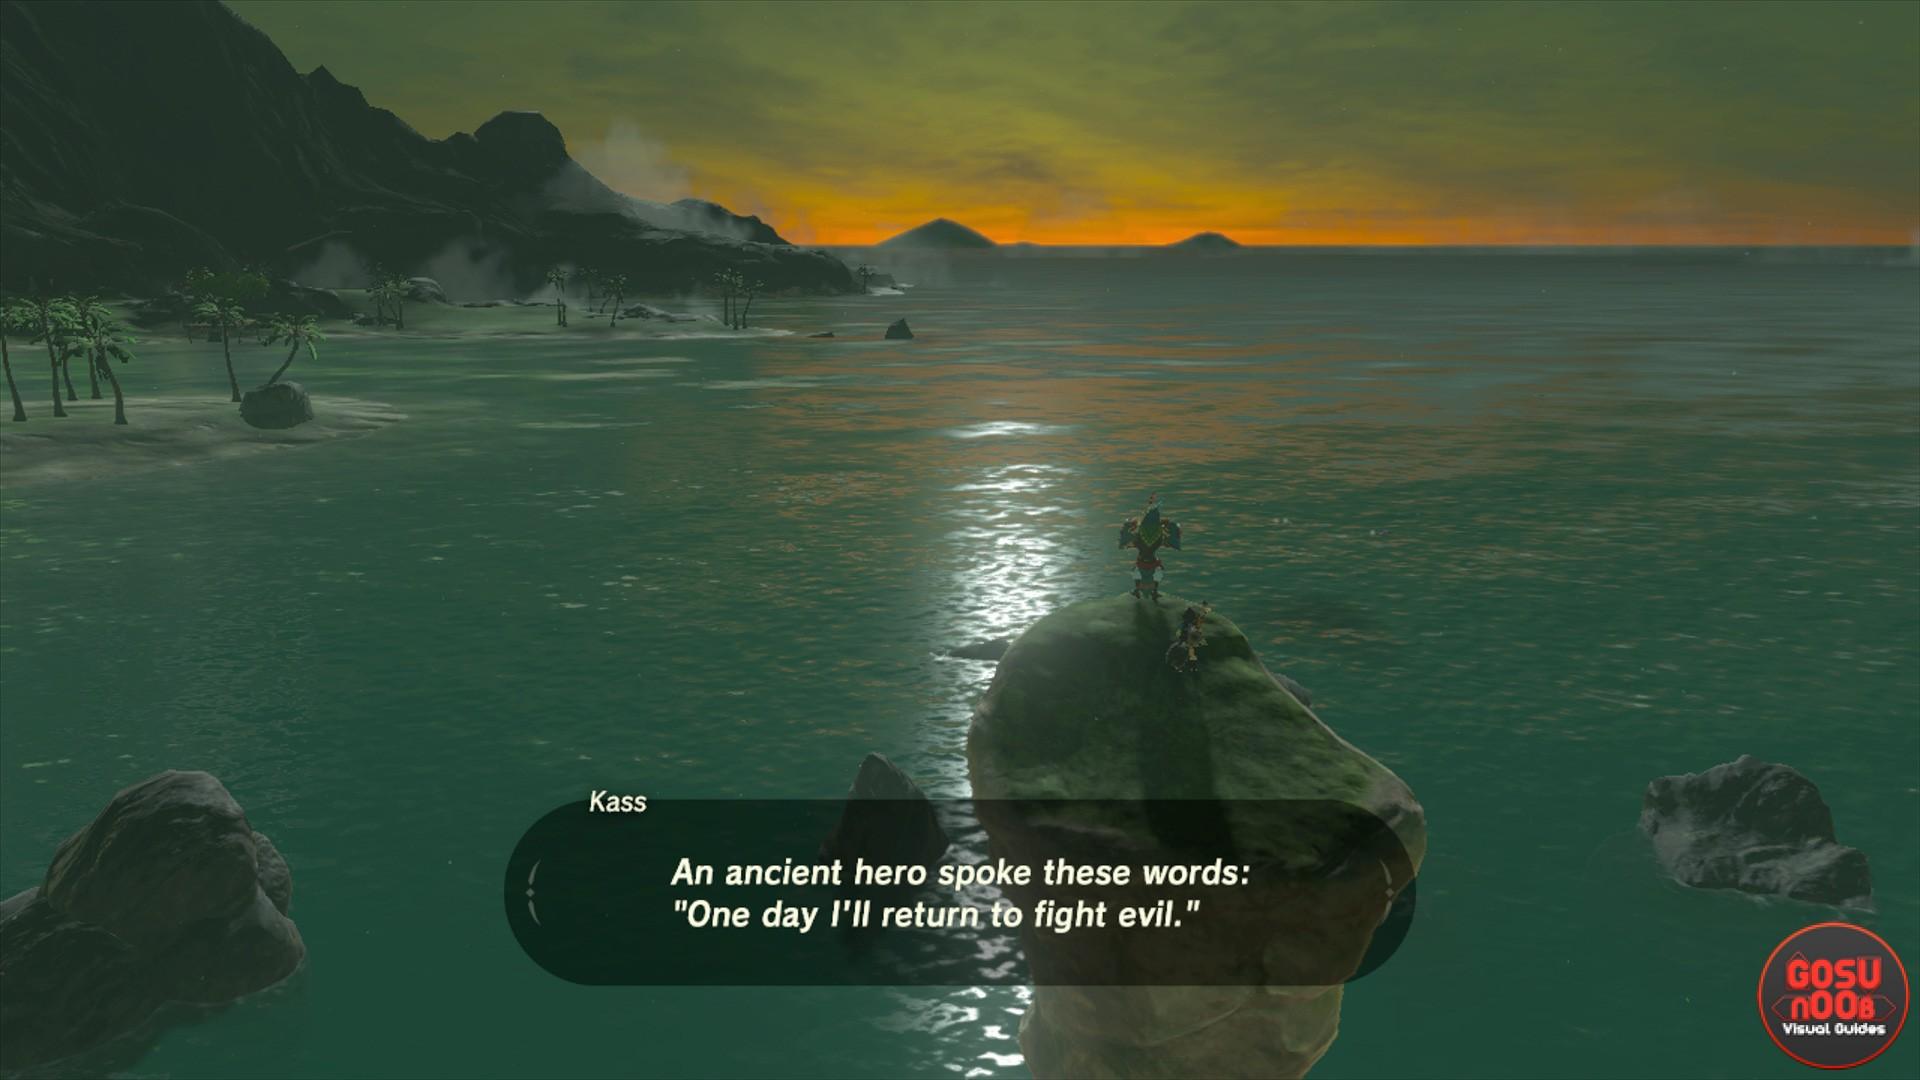 Zelda Botw Kass Secret Shrine Locations And Riddle Solutions